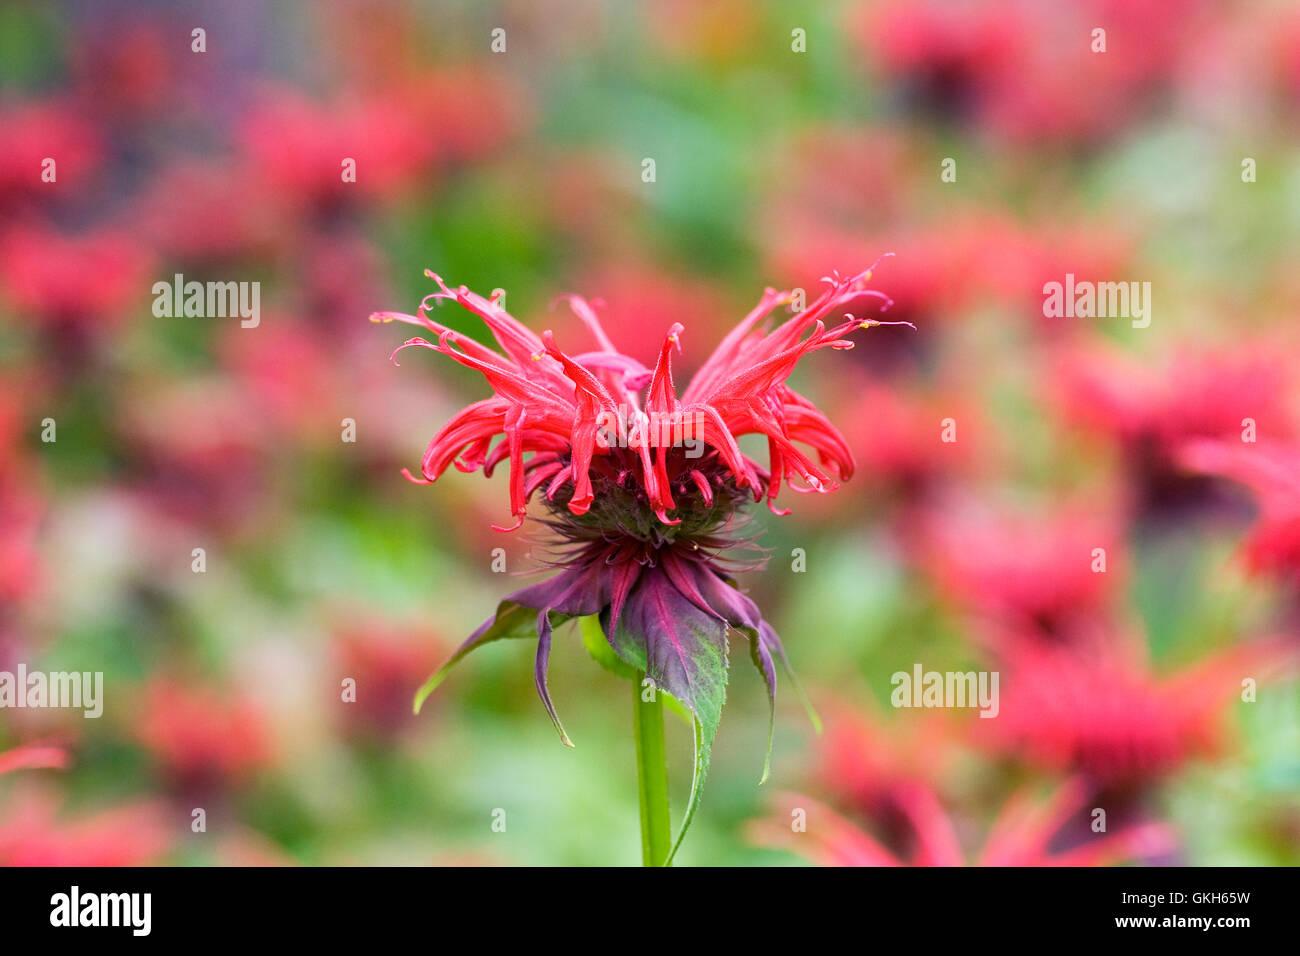 Monarda didyma 'Squaw'. Bergamot flowers. - Stock Image